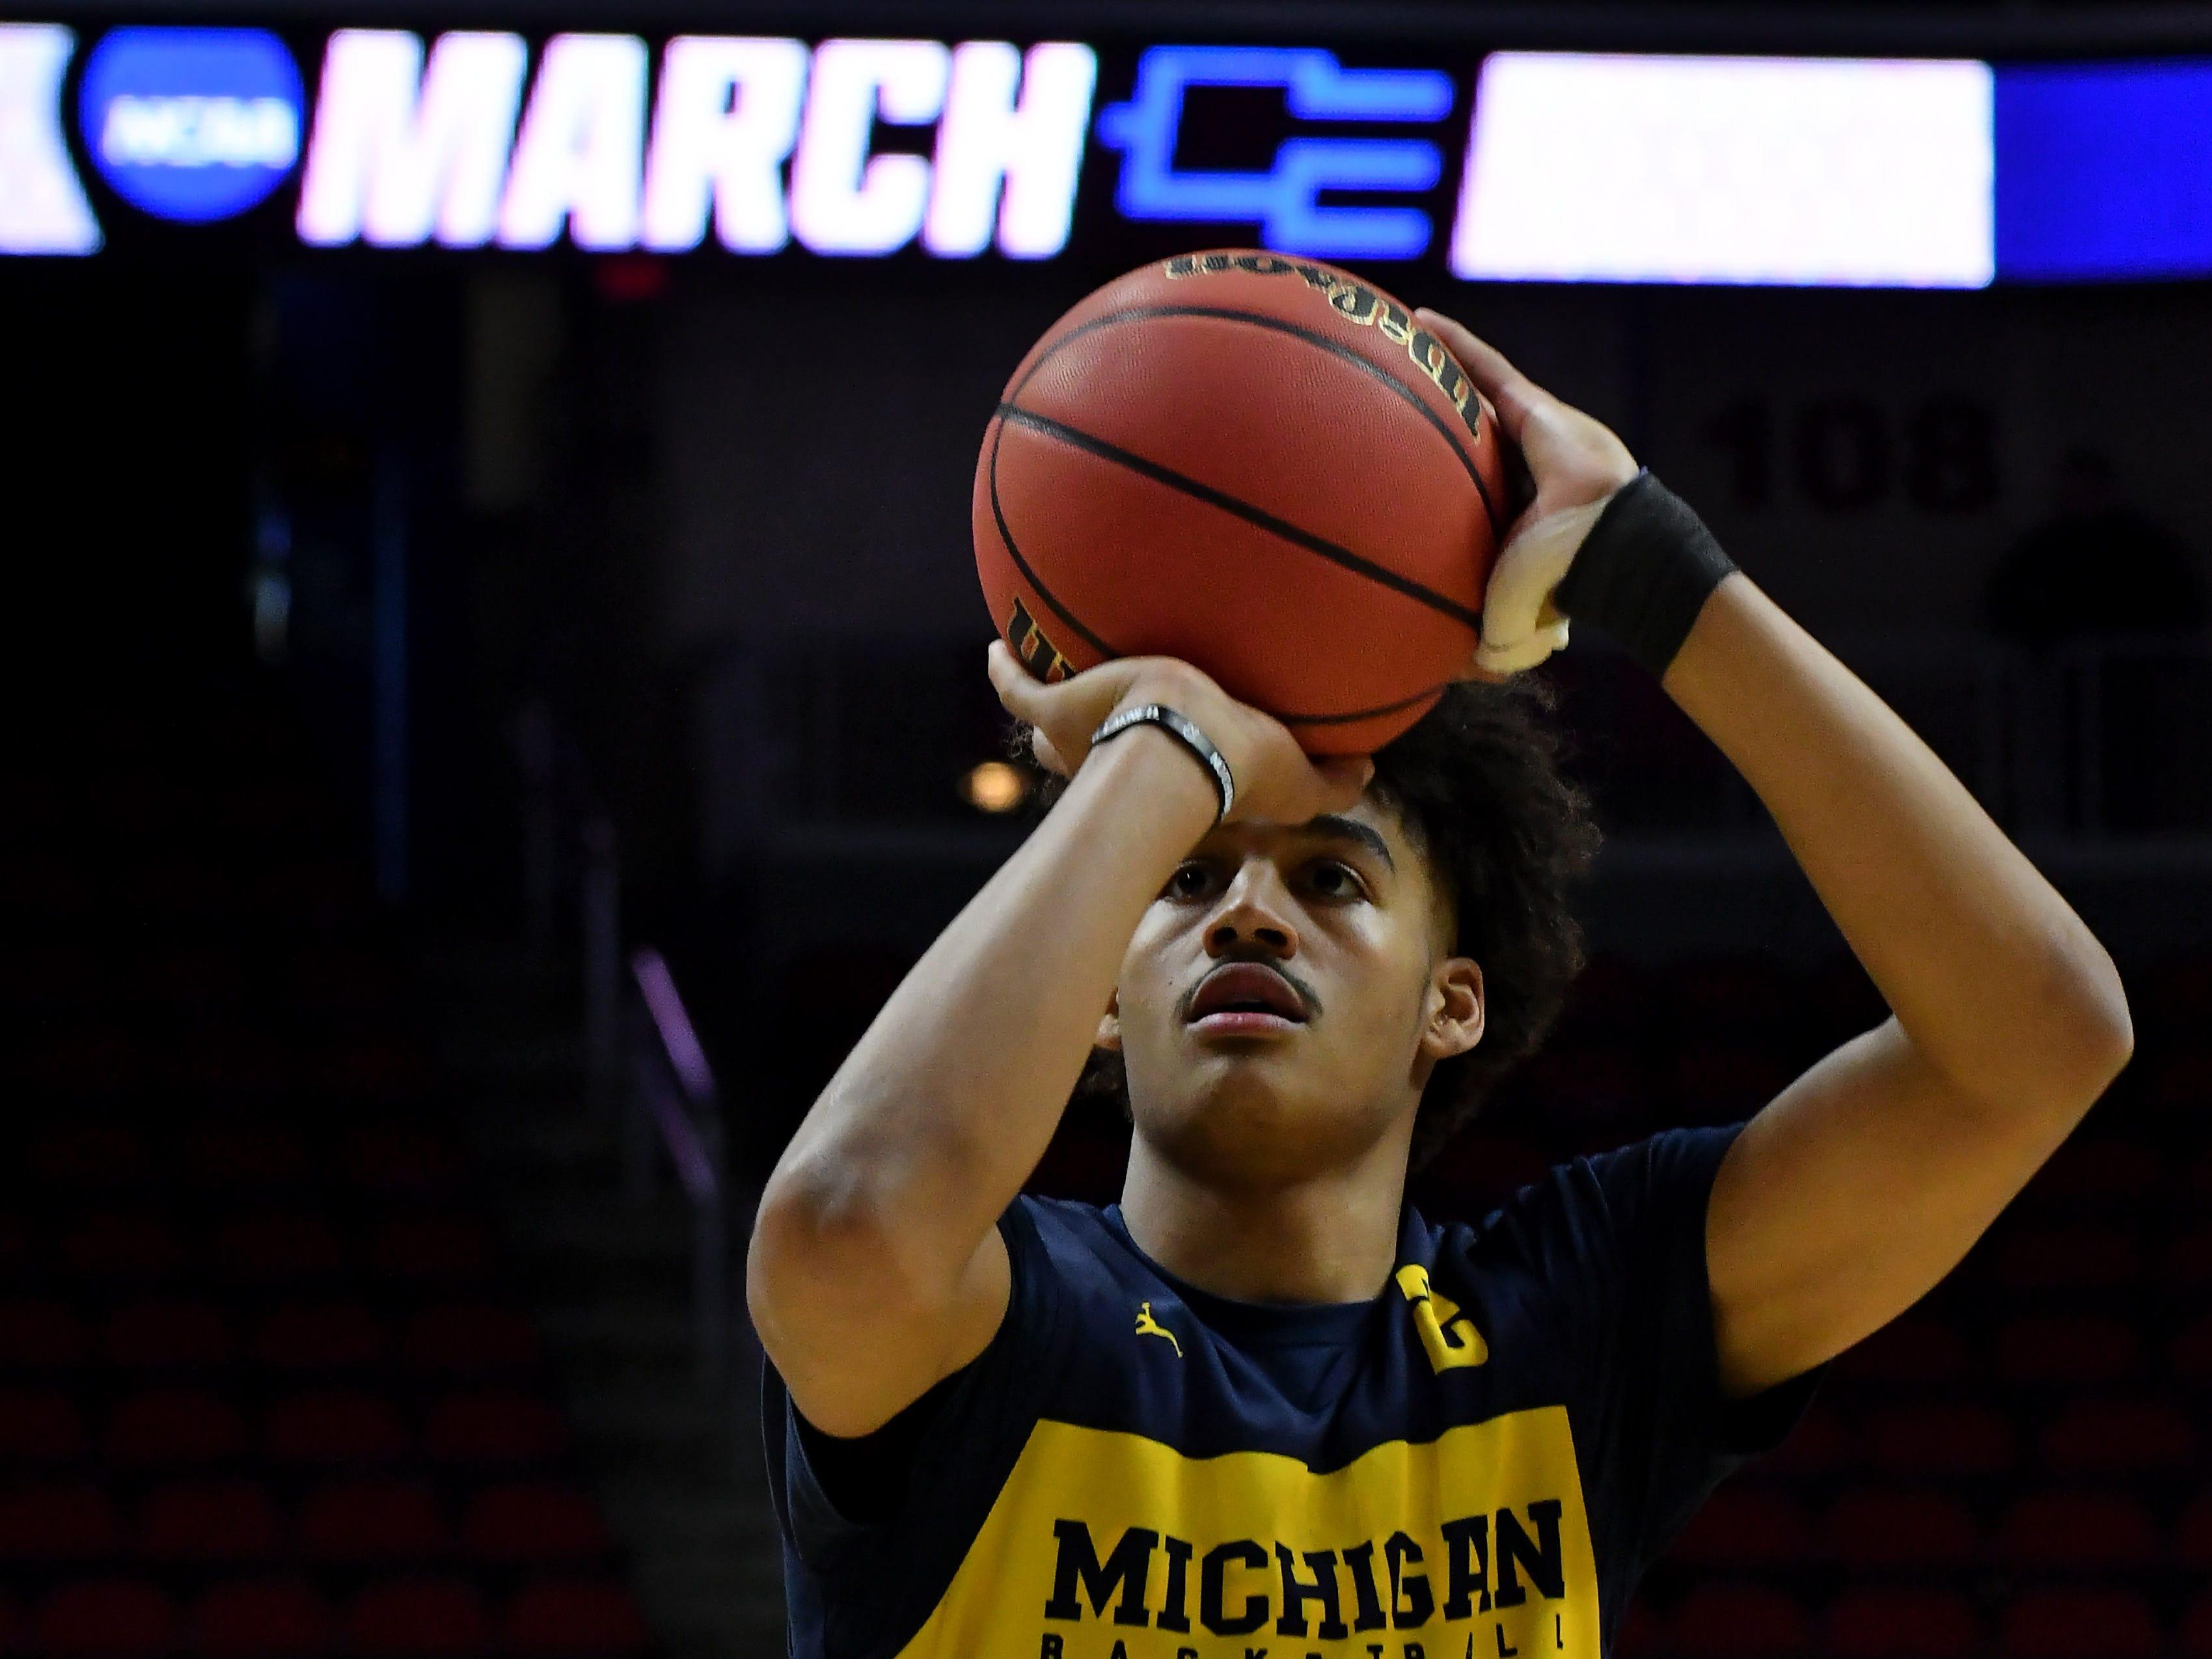 Michigan guard Jordan Poole shoots free throws at Michigan practice.